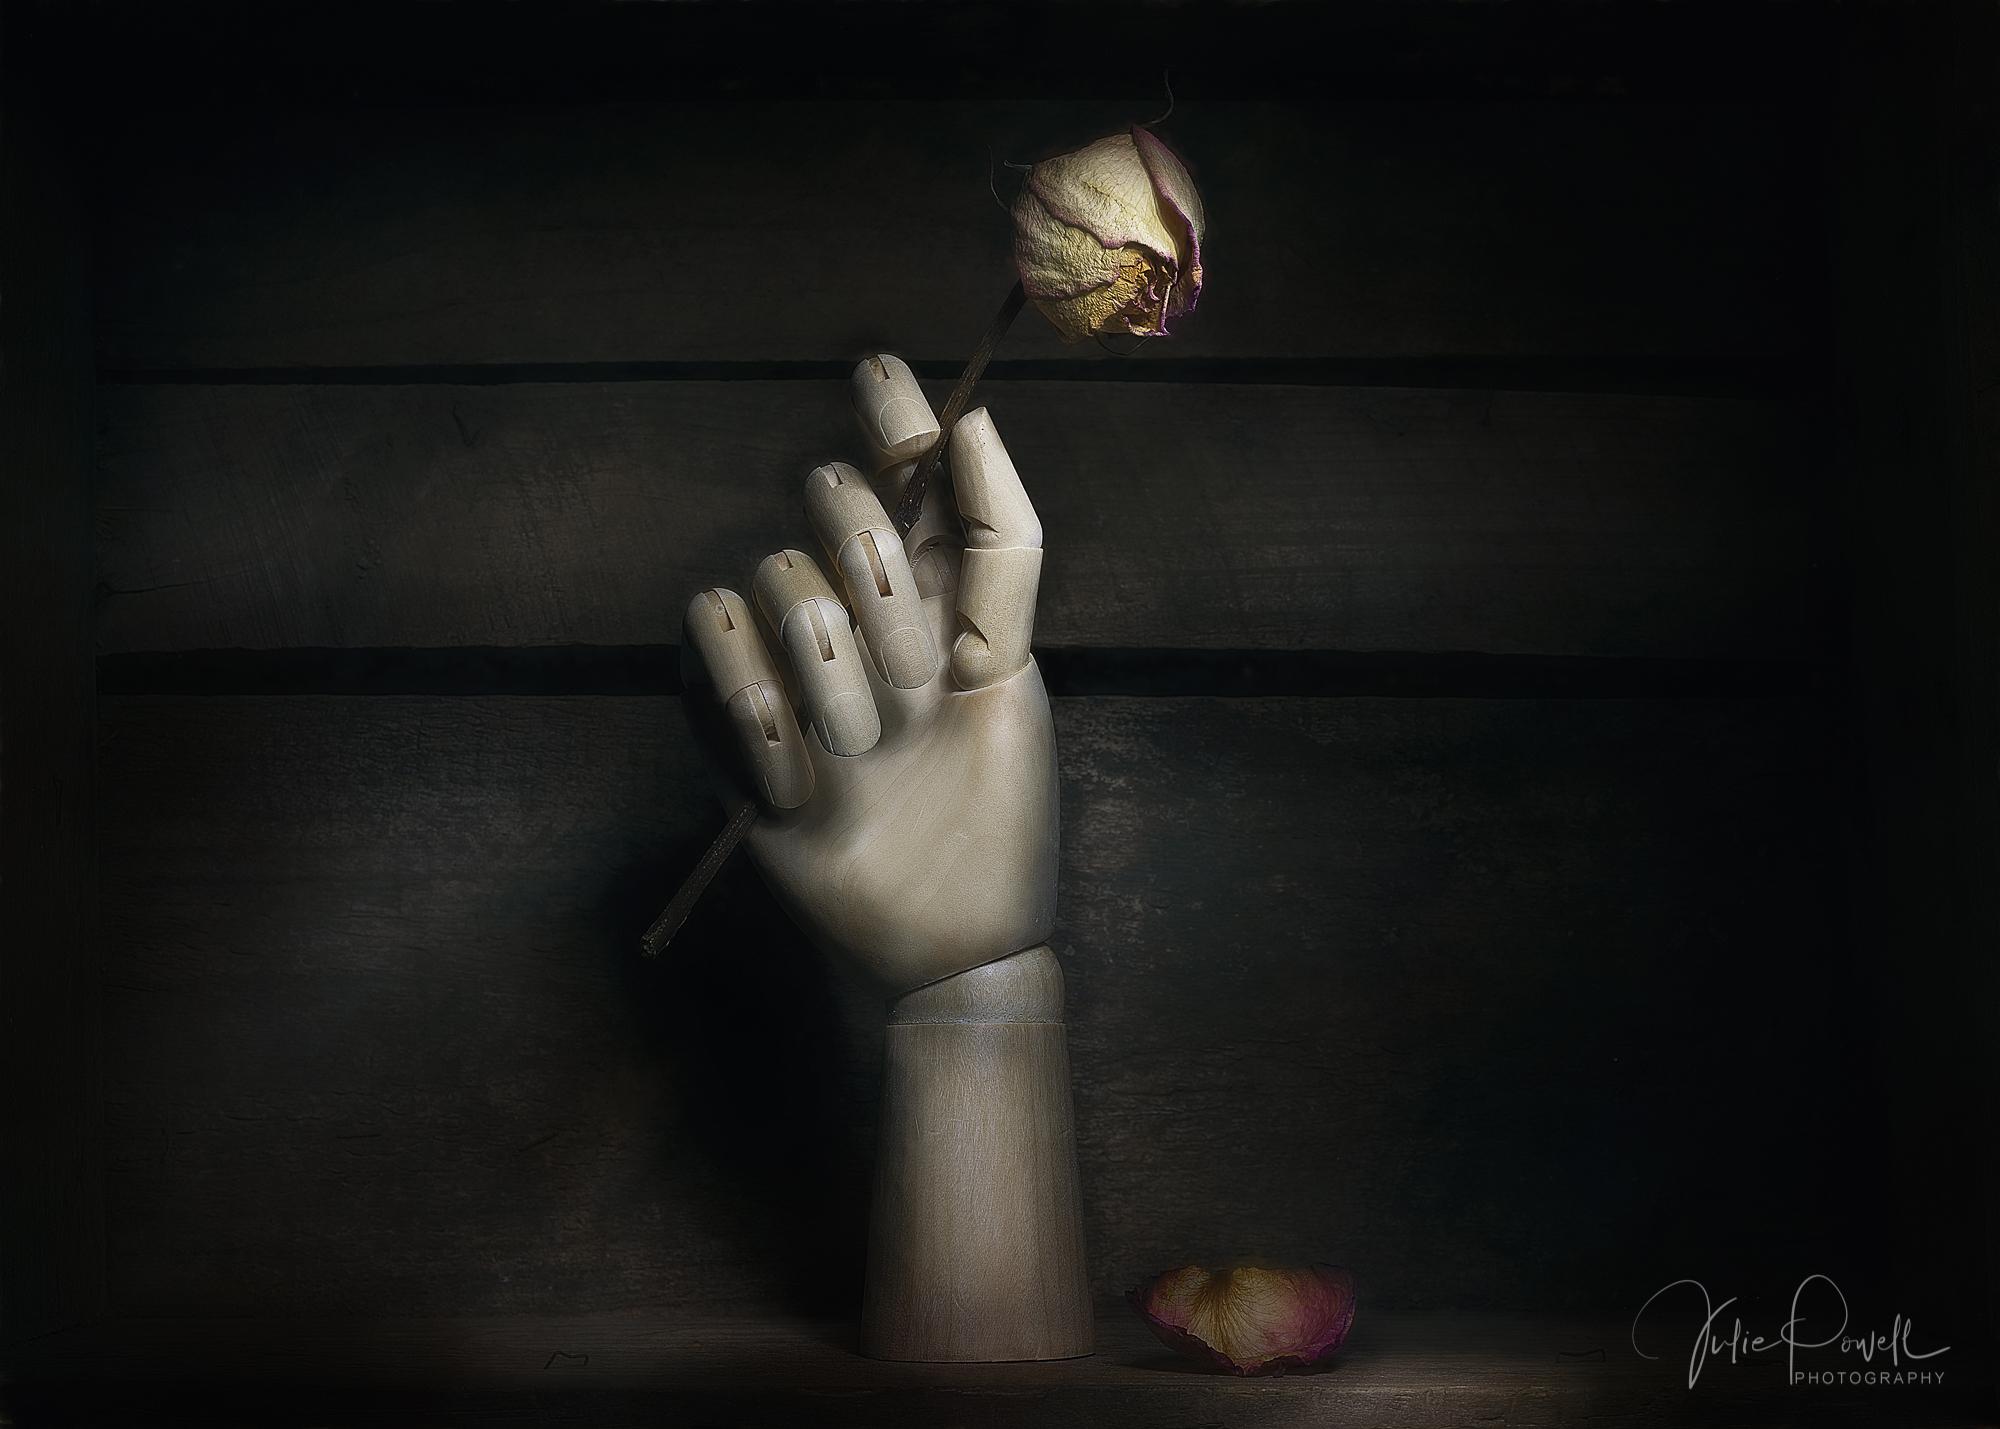 Julie Powell_The Rose.jpg